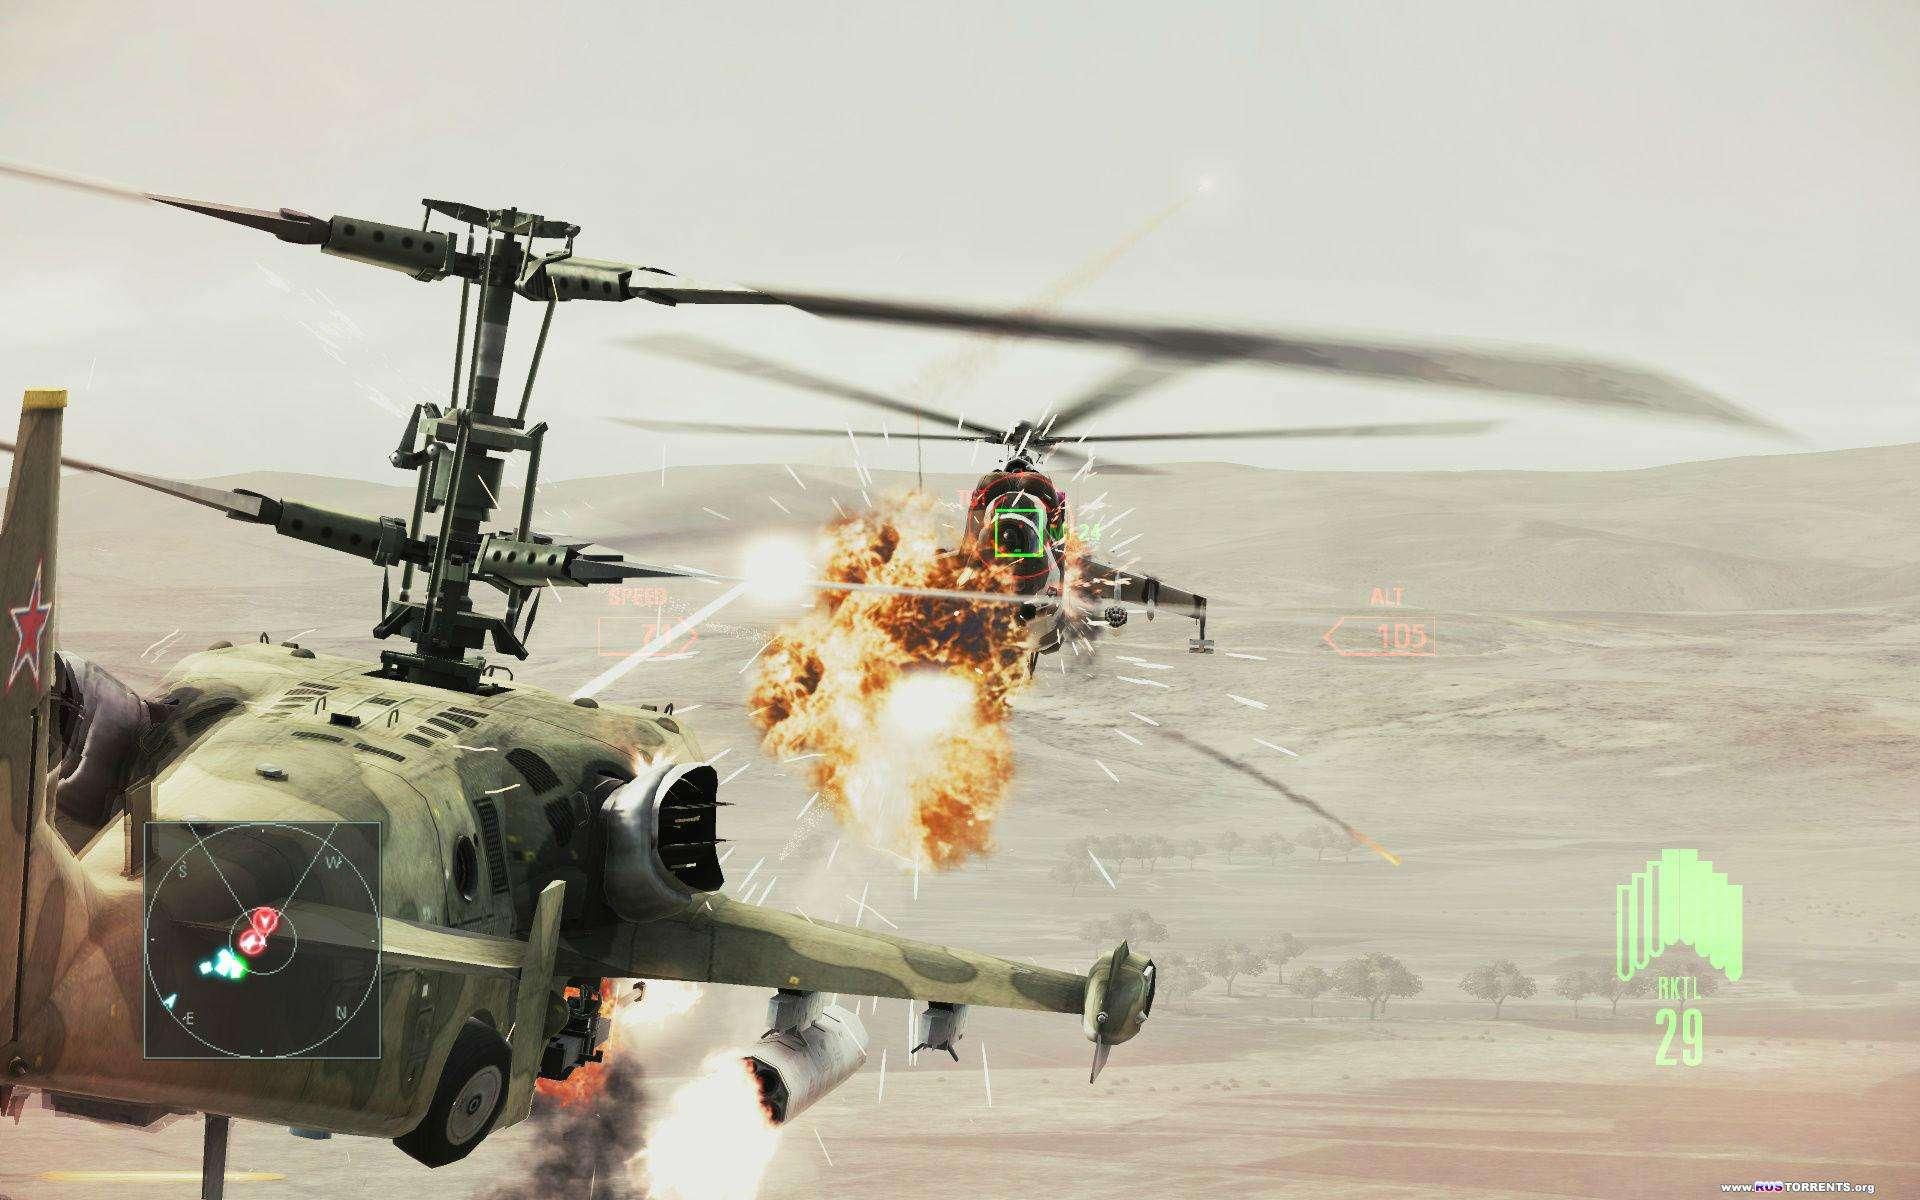 Ace Combat: Assault Horizon. Enhanced Edition (Namco Bandai) (RUS-MULTI9) [Steam-Rip] [DL] От R.G. Игроманы